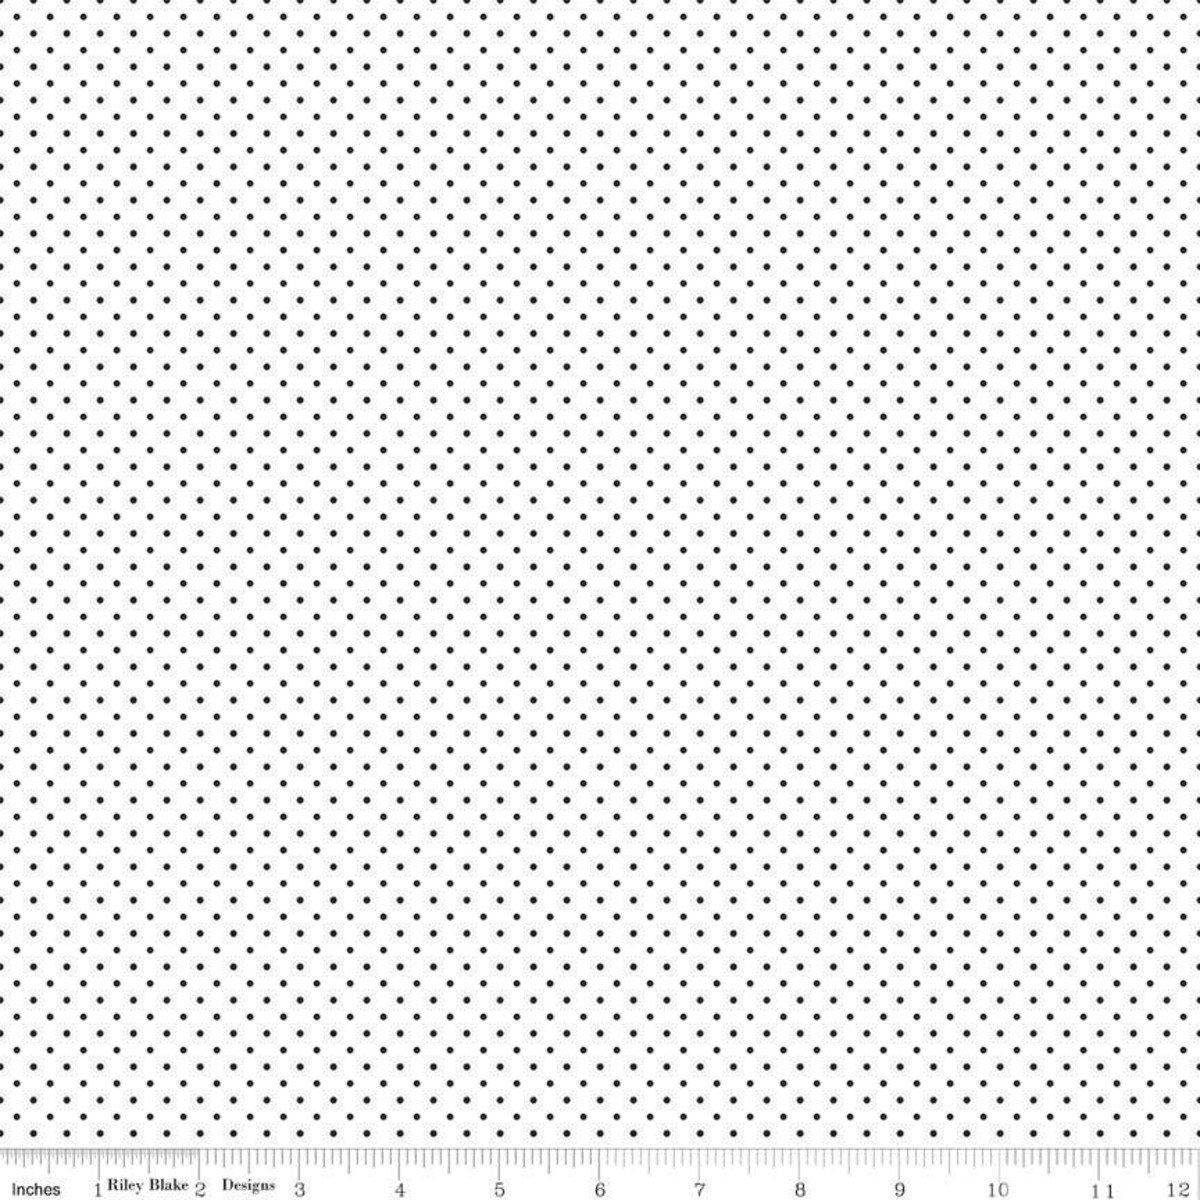 Riley Blake Swiss Dot On White Black C660-110 BLACK